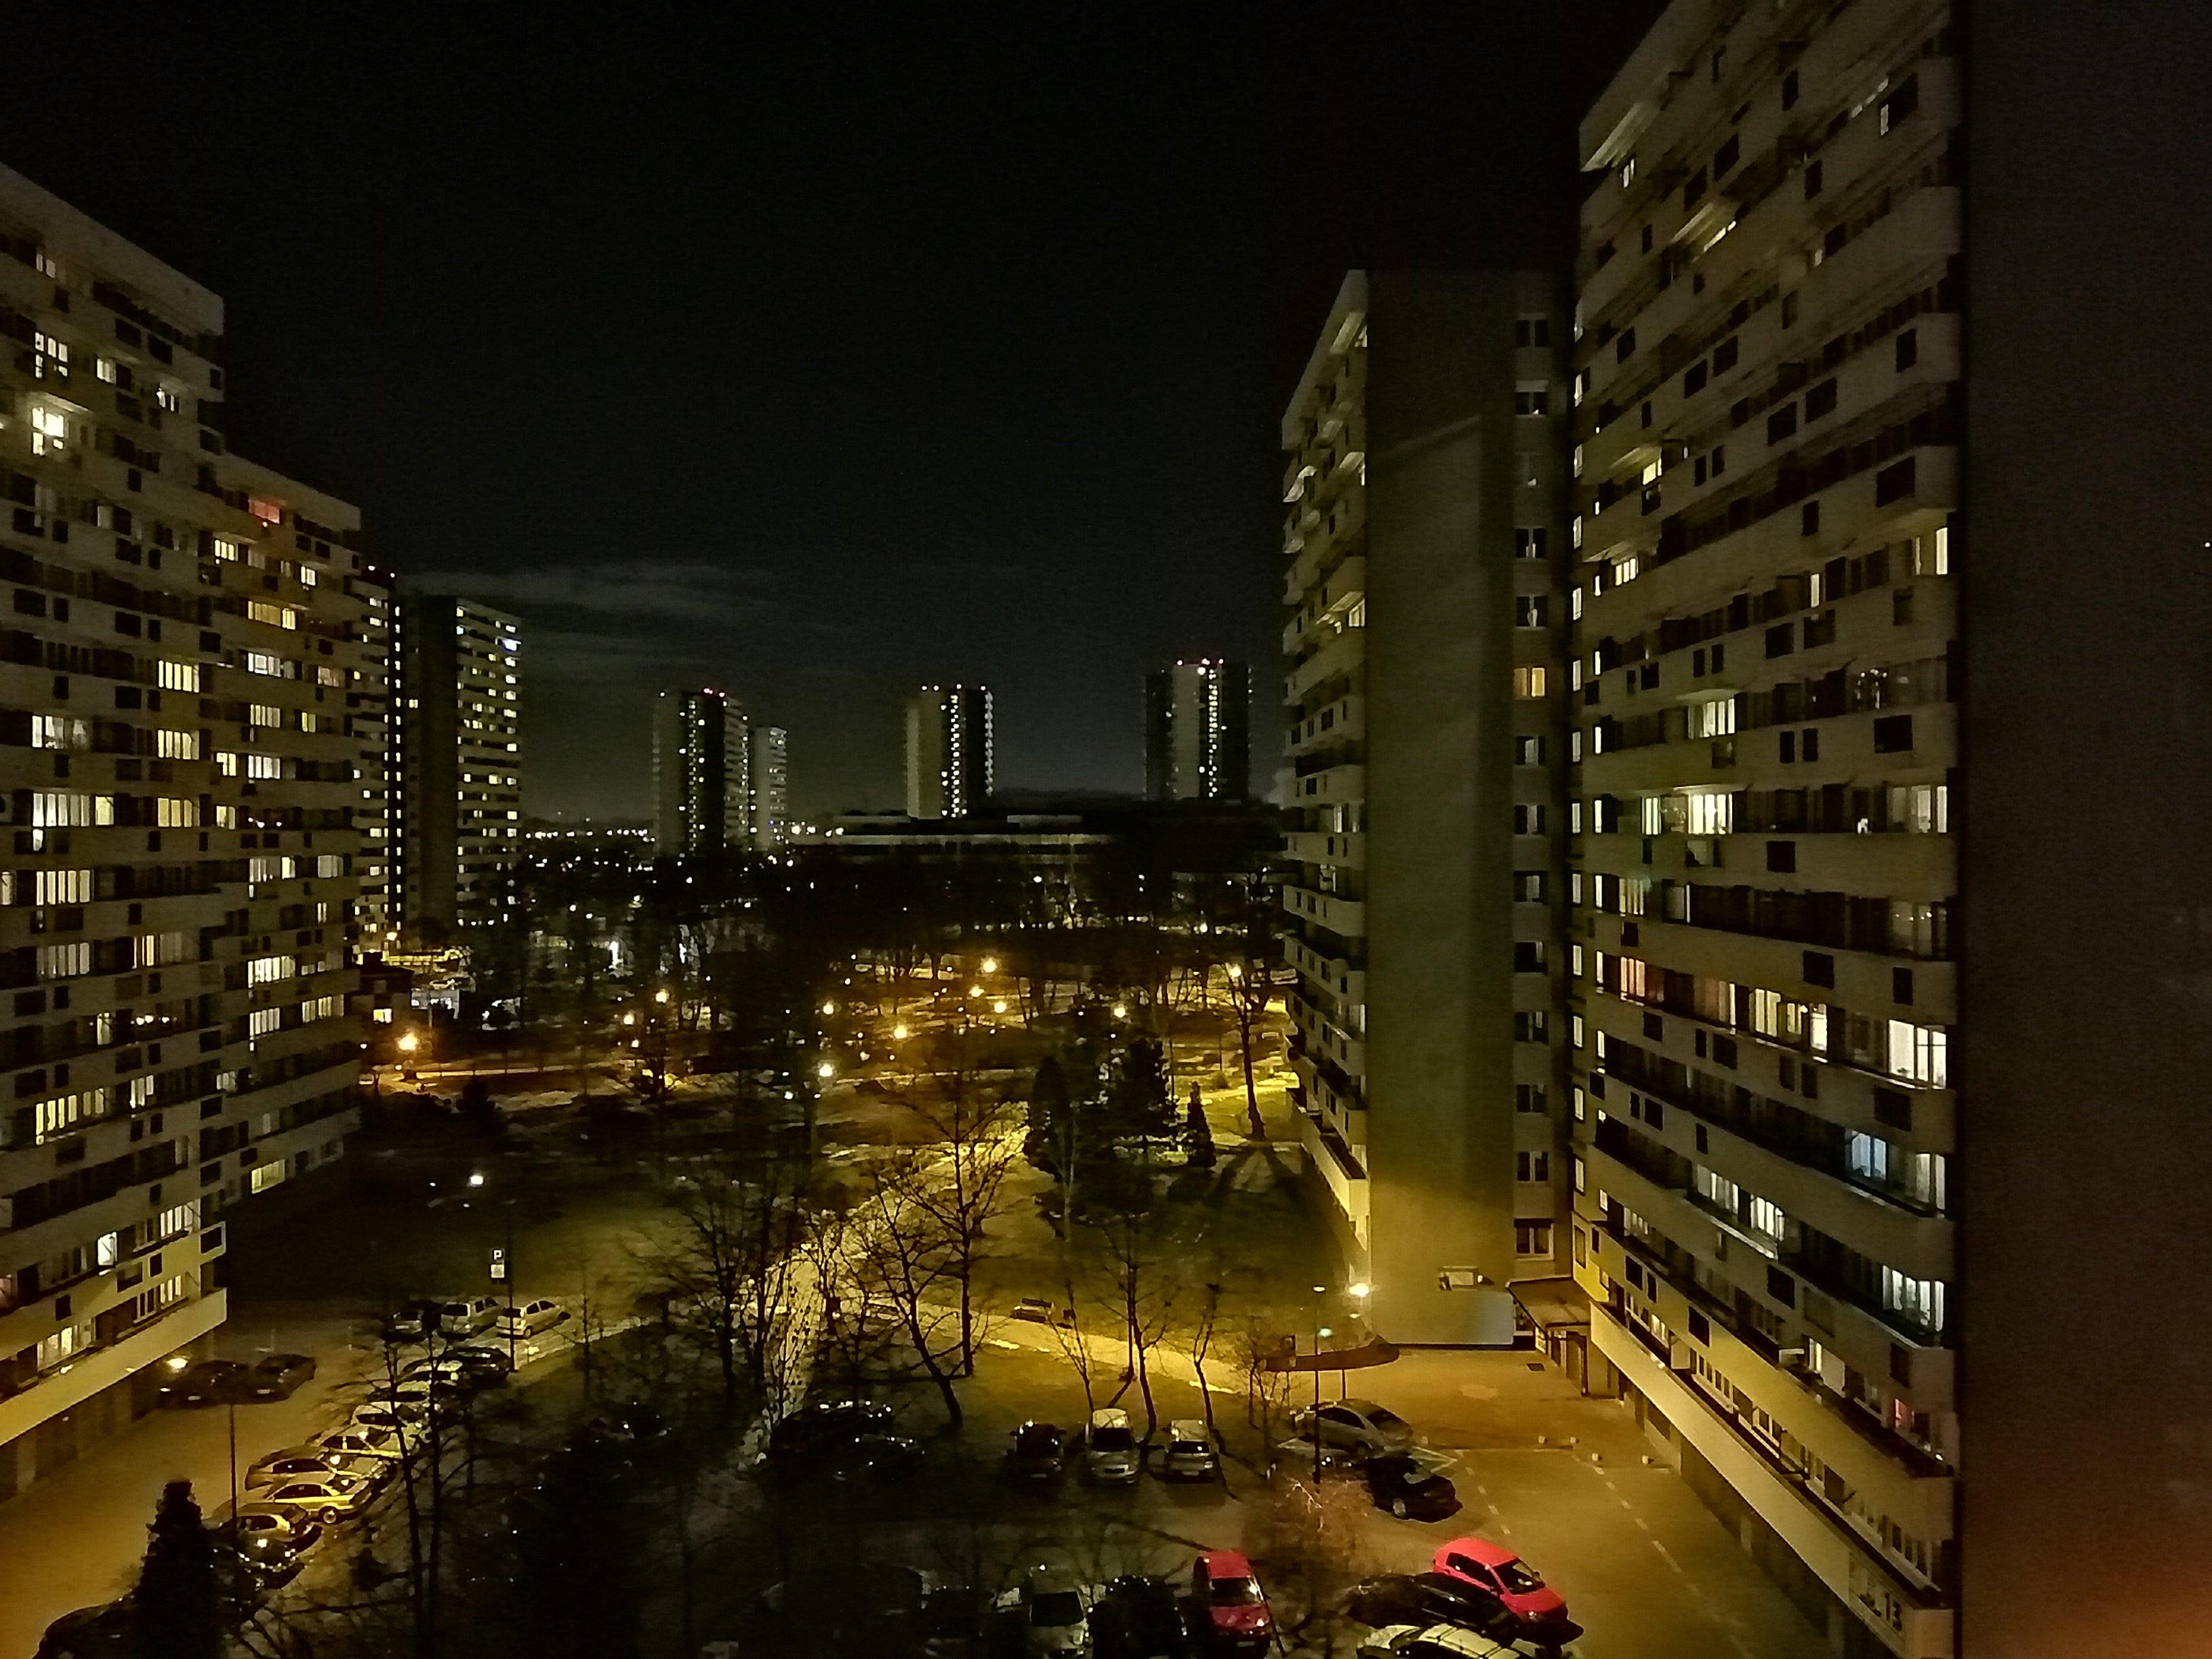 Zdjęcia nocne - Huawei P Smart 2019